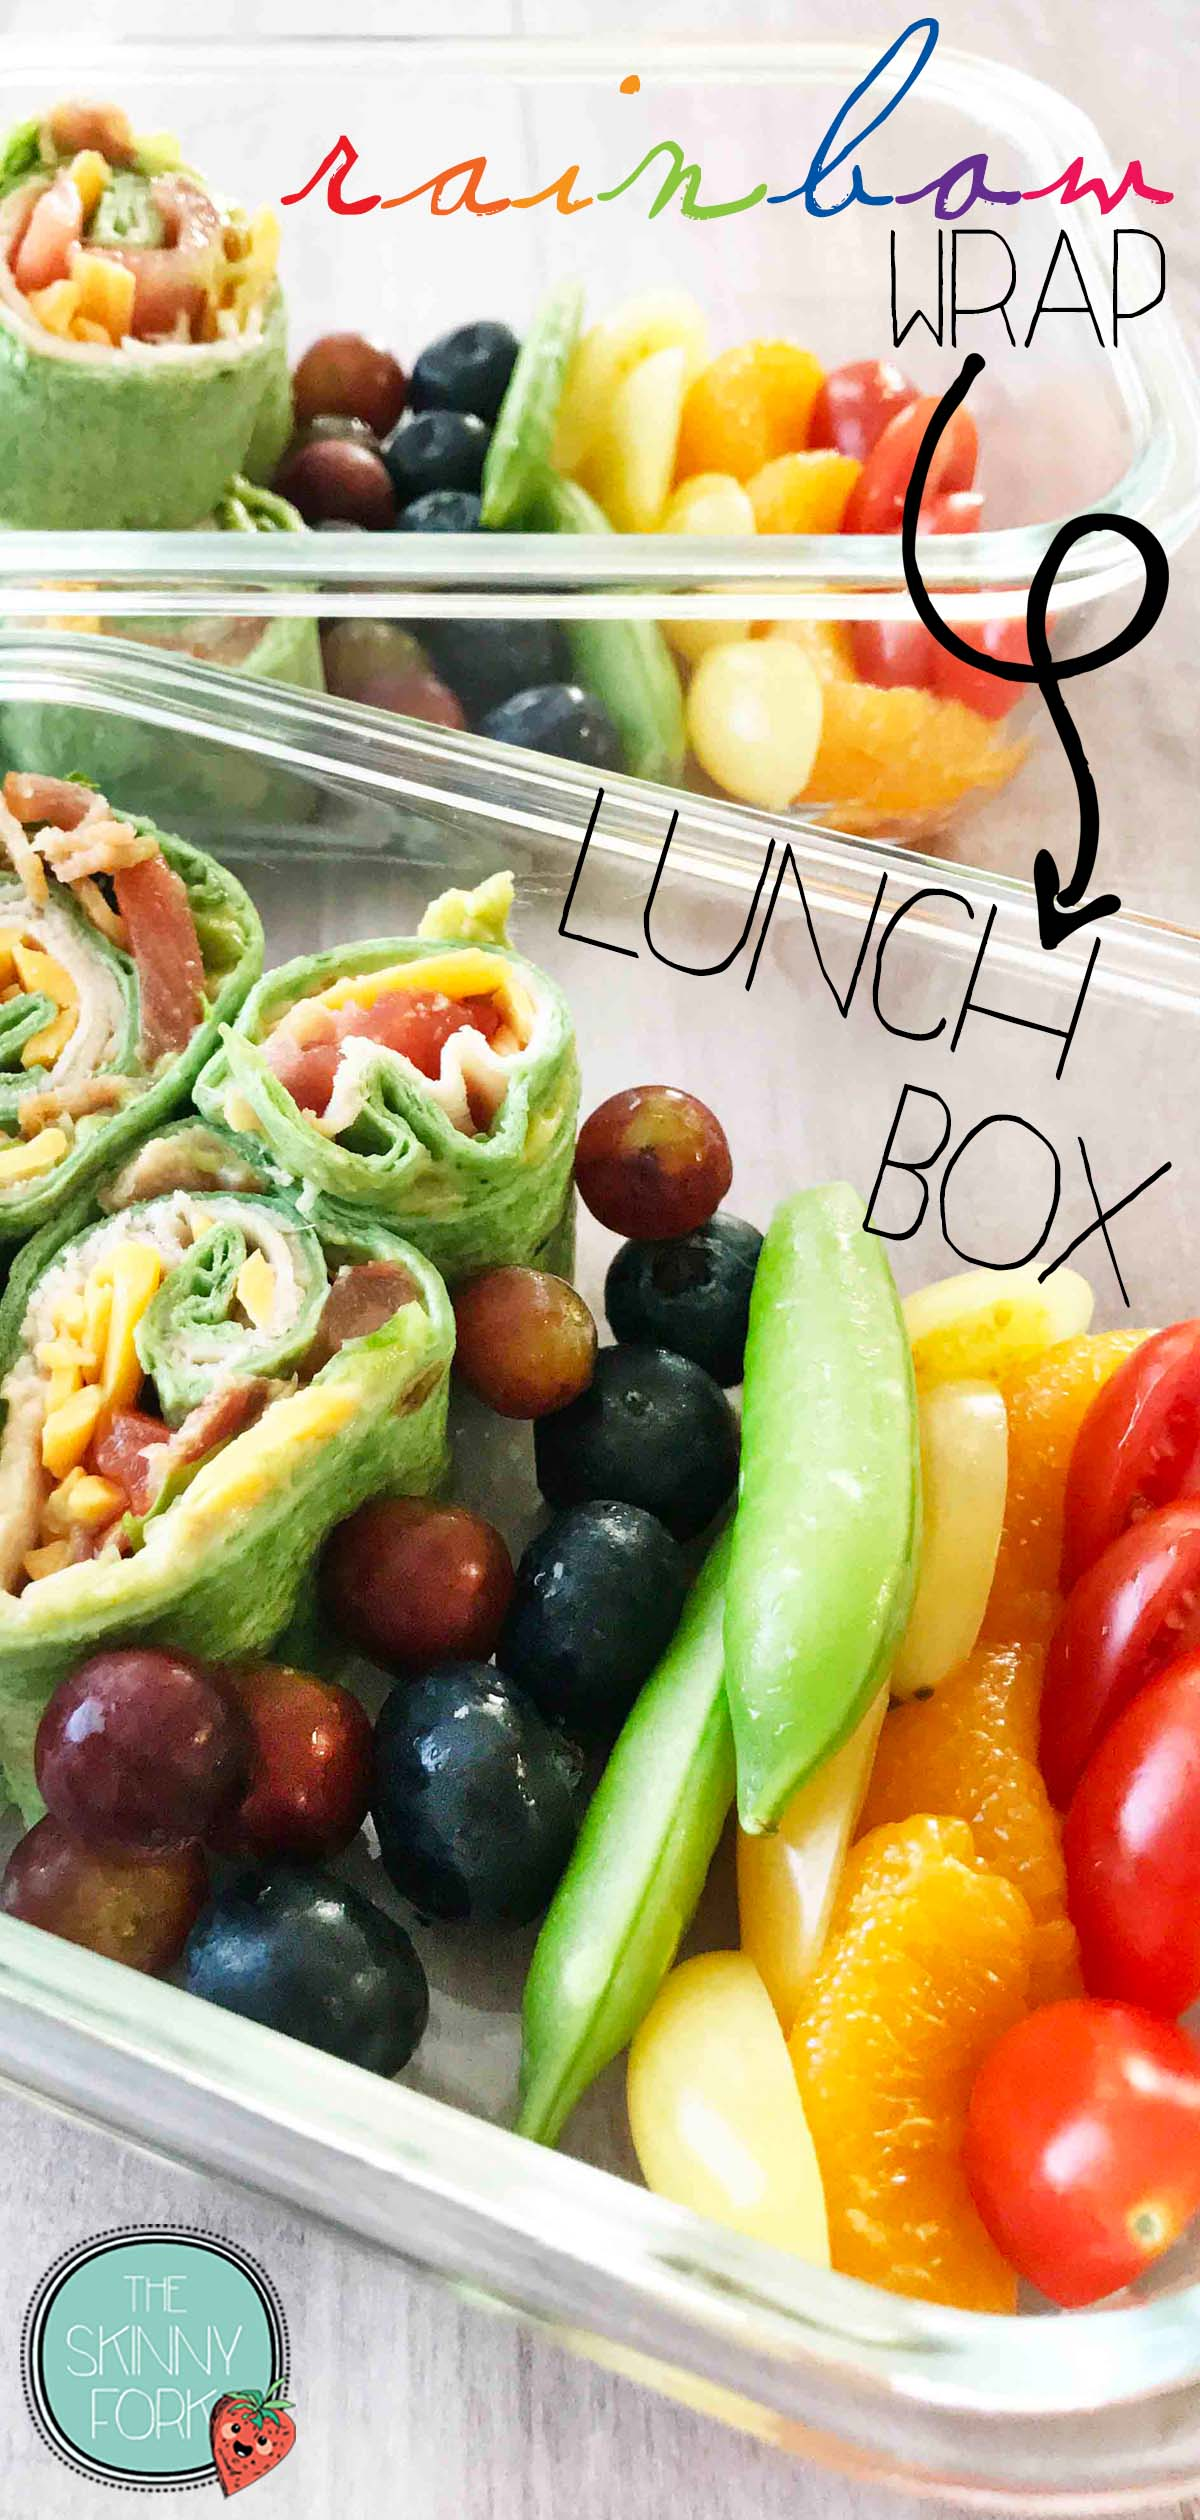 Rainbow Wrap Lunch Box